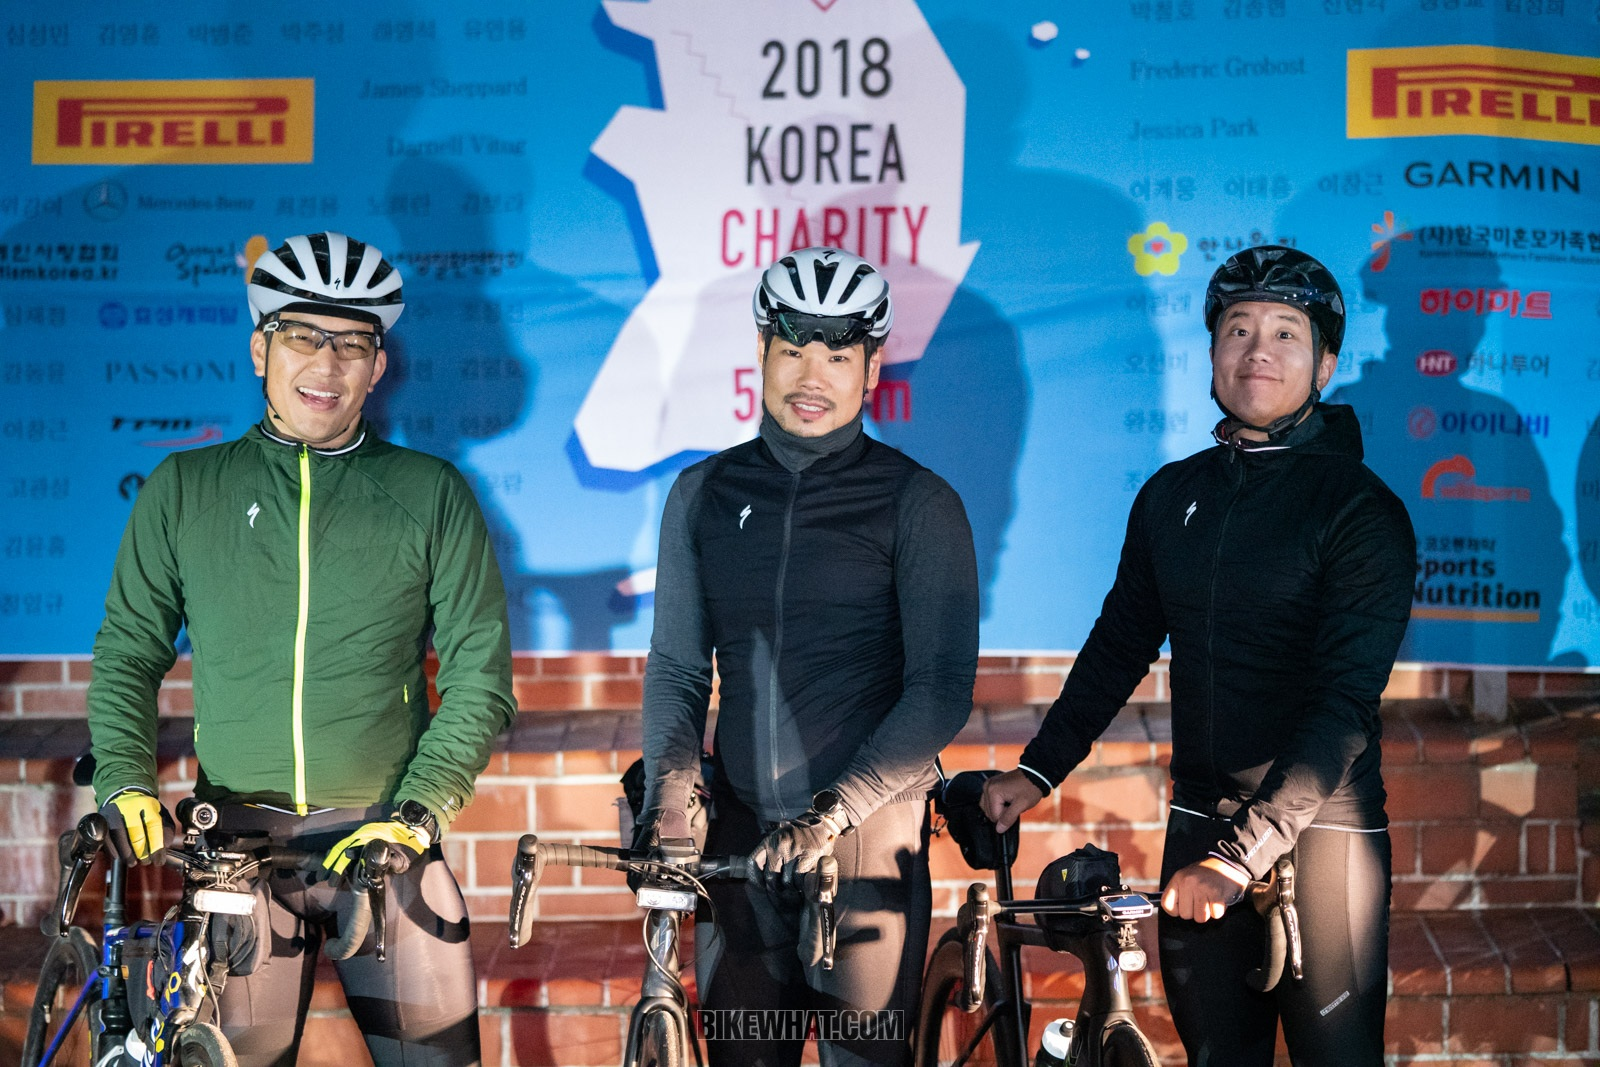 Charity_ride_2018 (22).jpg